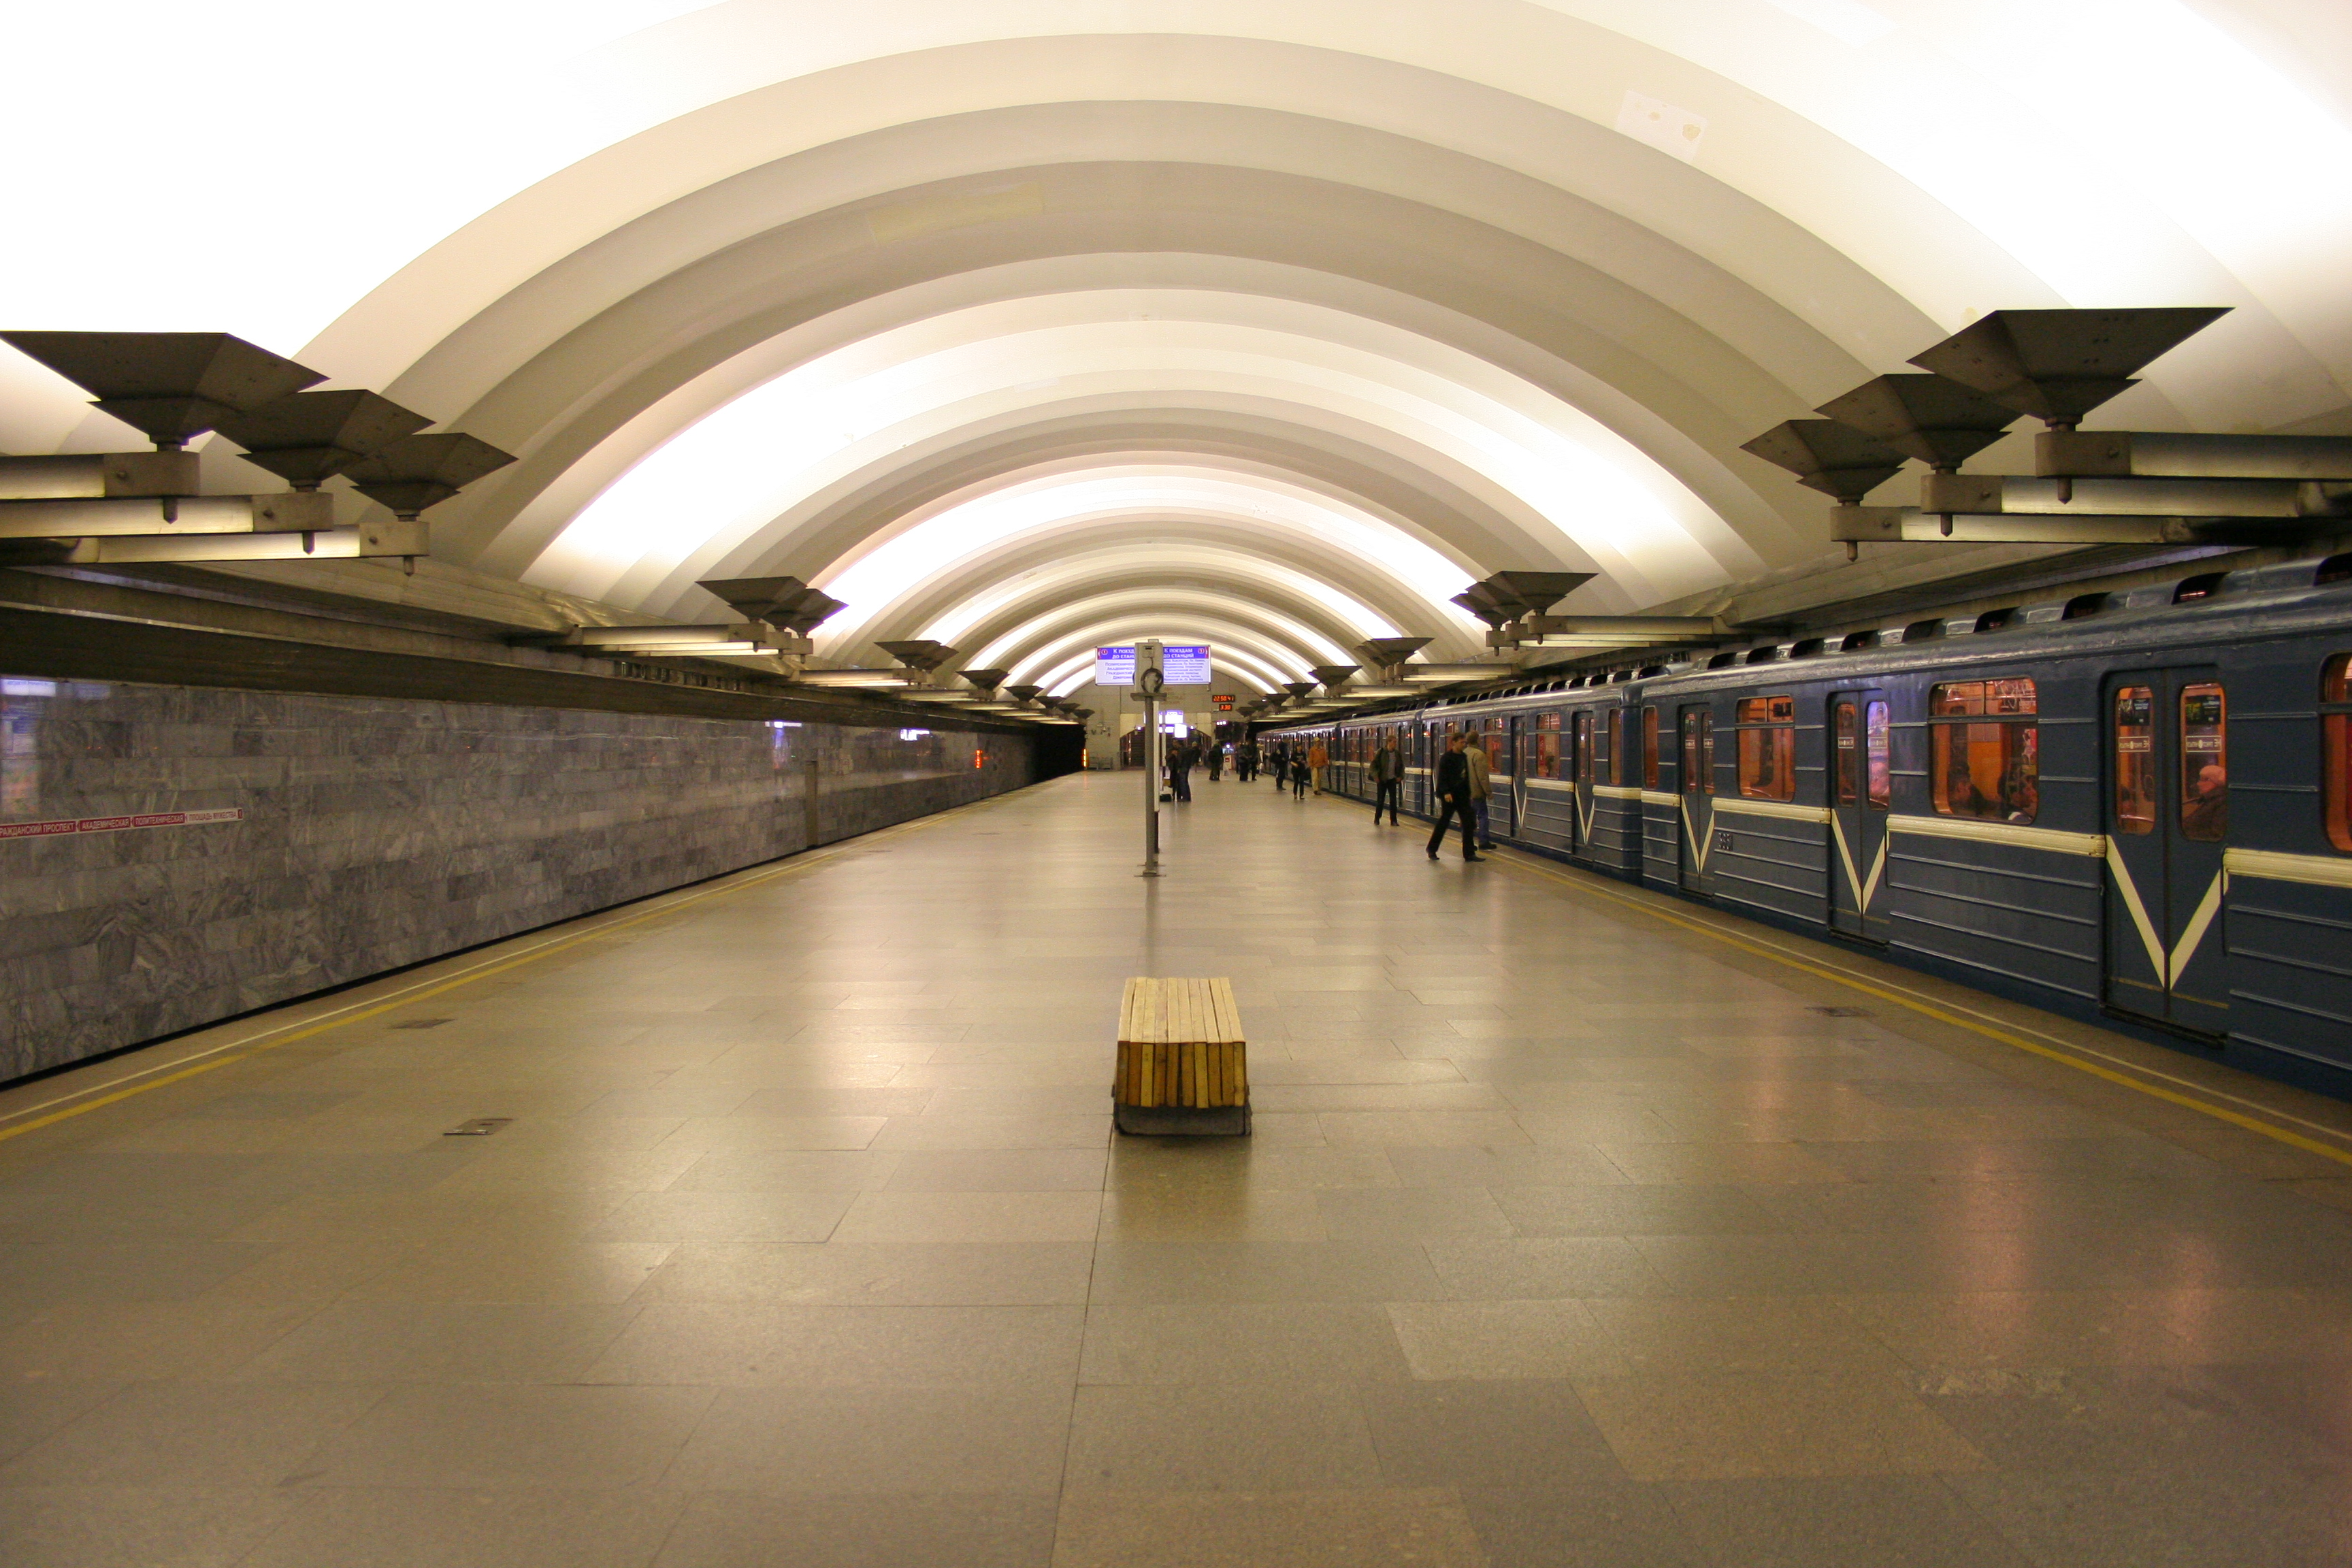 Впетербургском метро проведут Wi-Fi